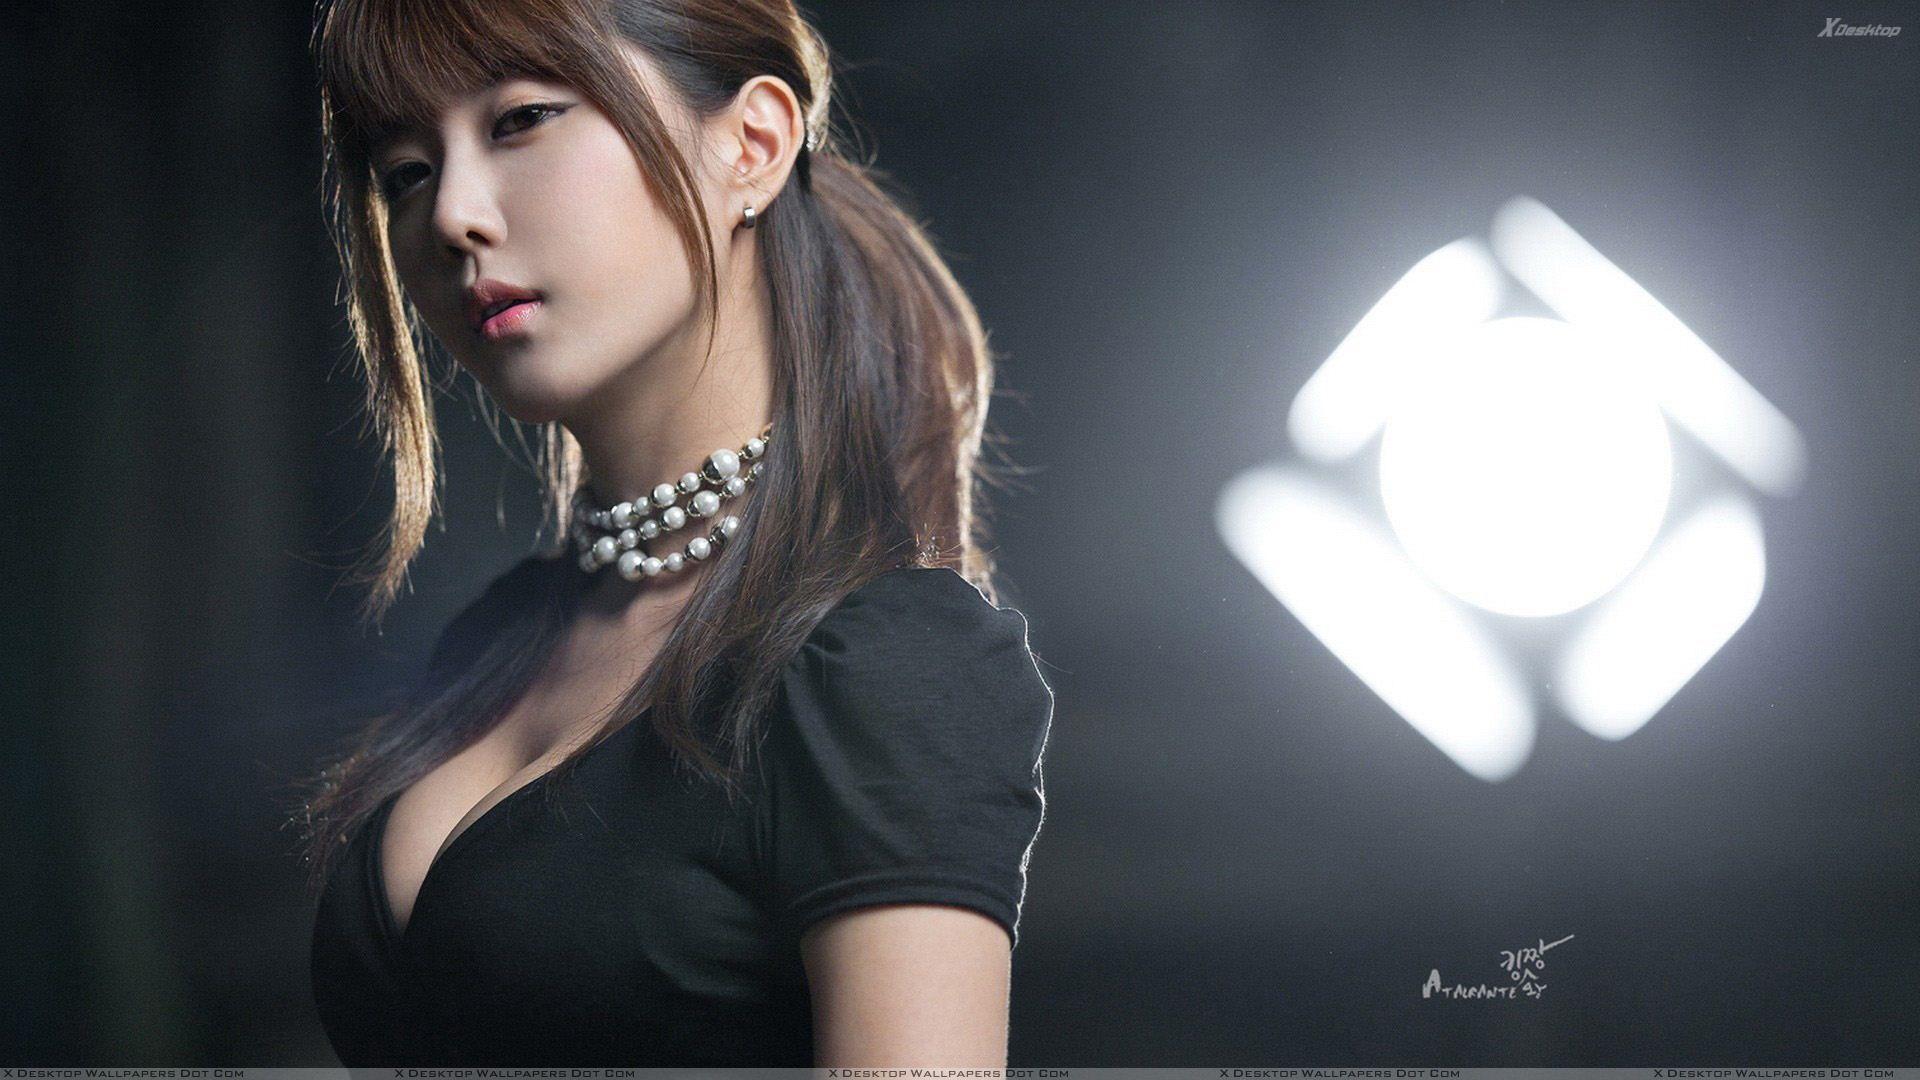 <h1>The Hot Korean Women Mask</h1>